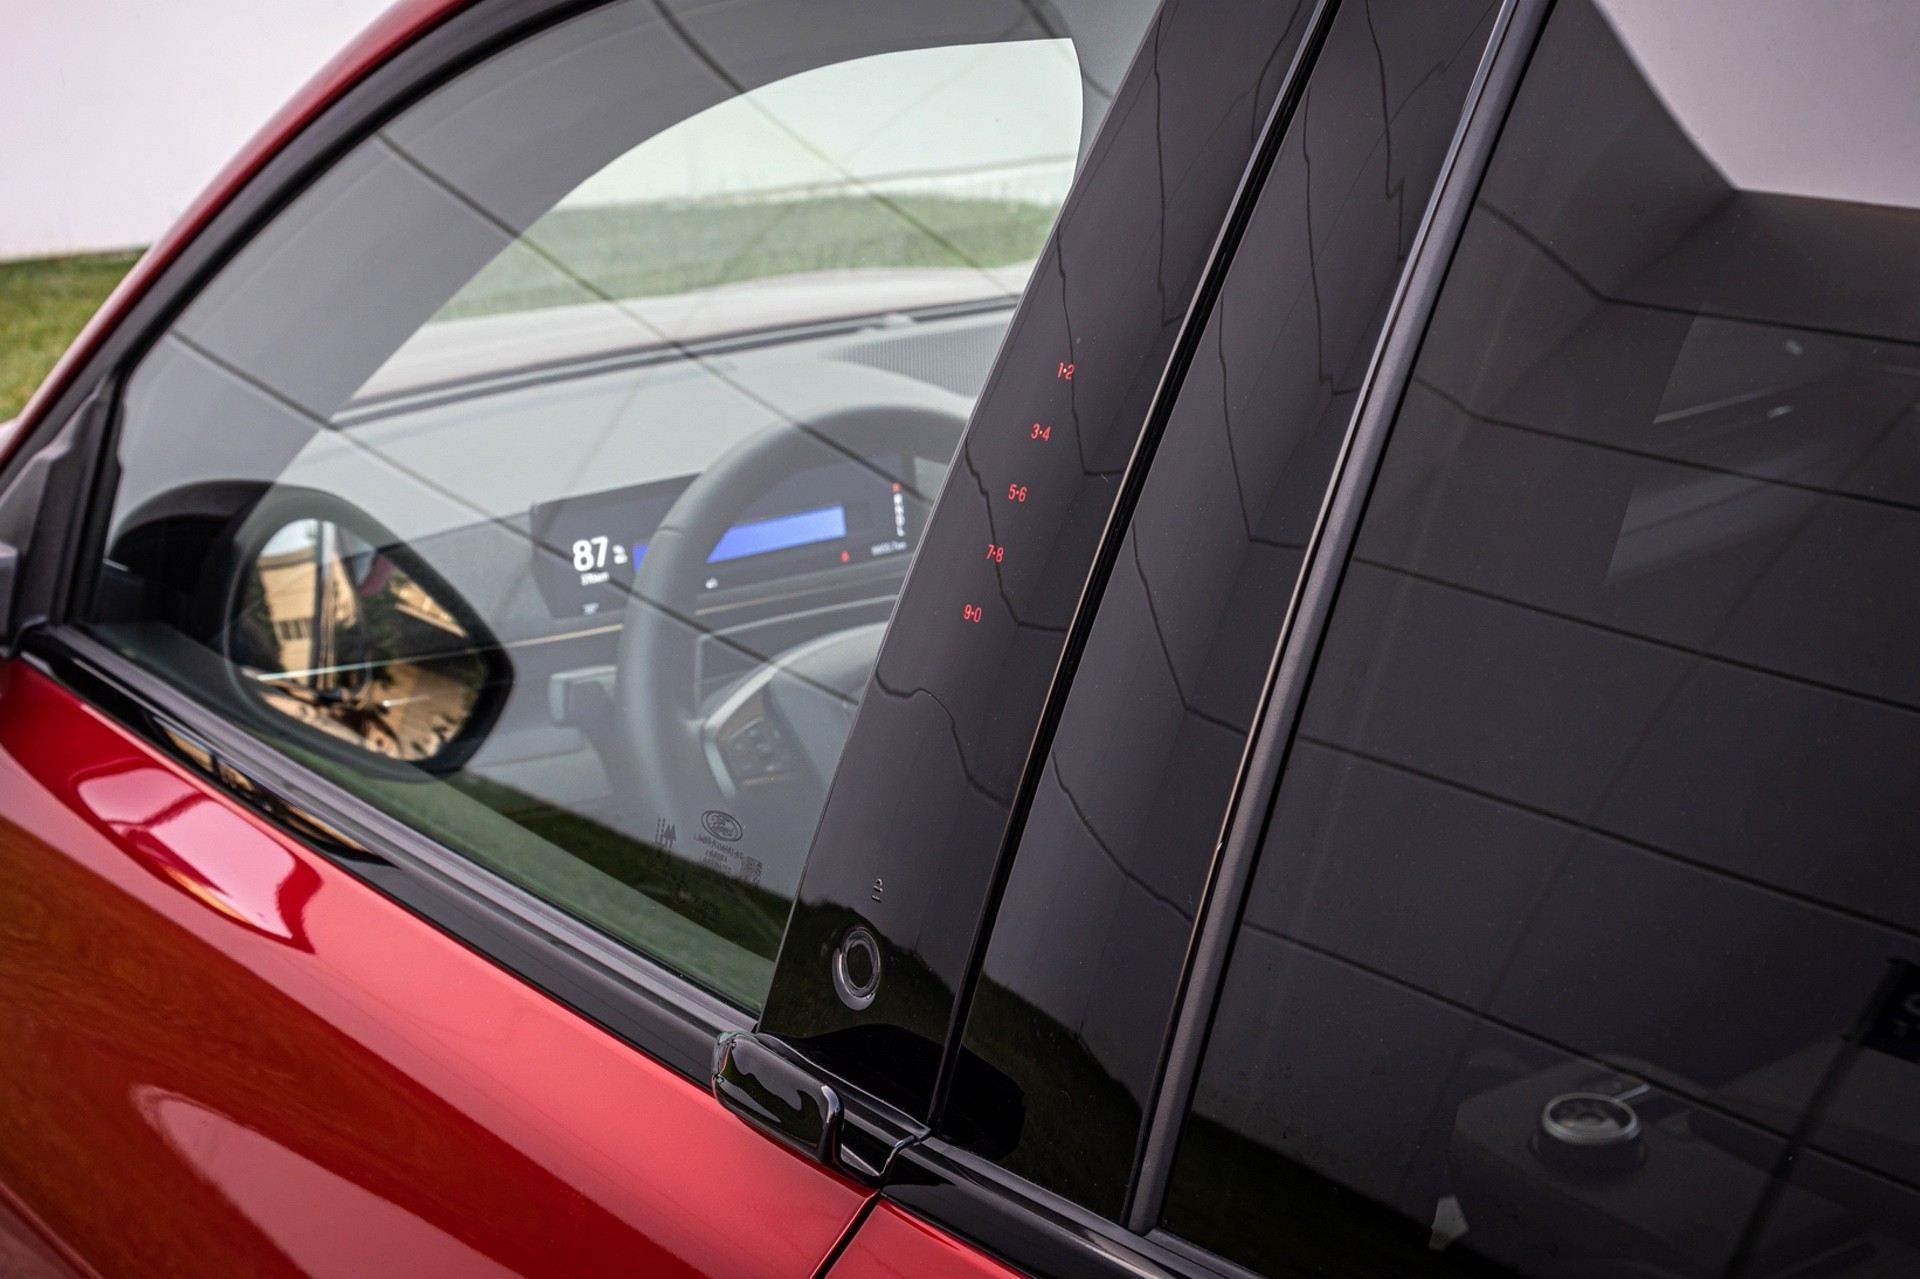 Ford_Mustang_Mach-E_greek_presskit-0148